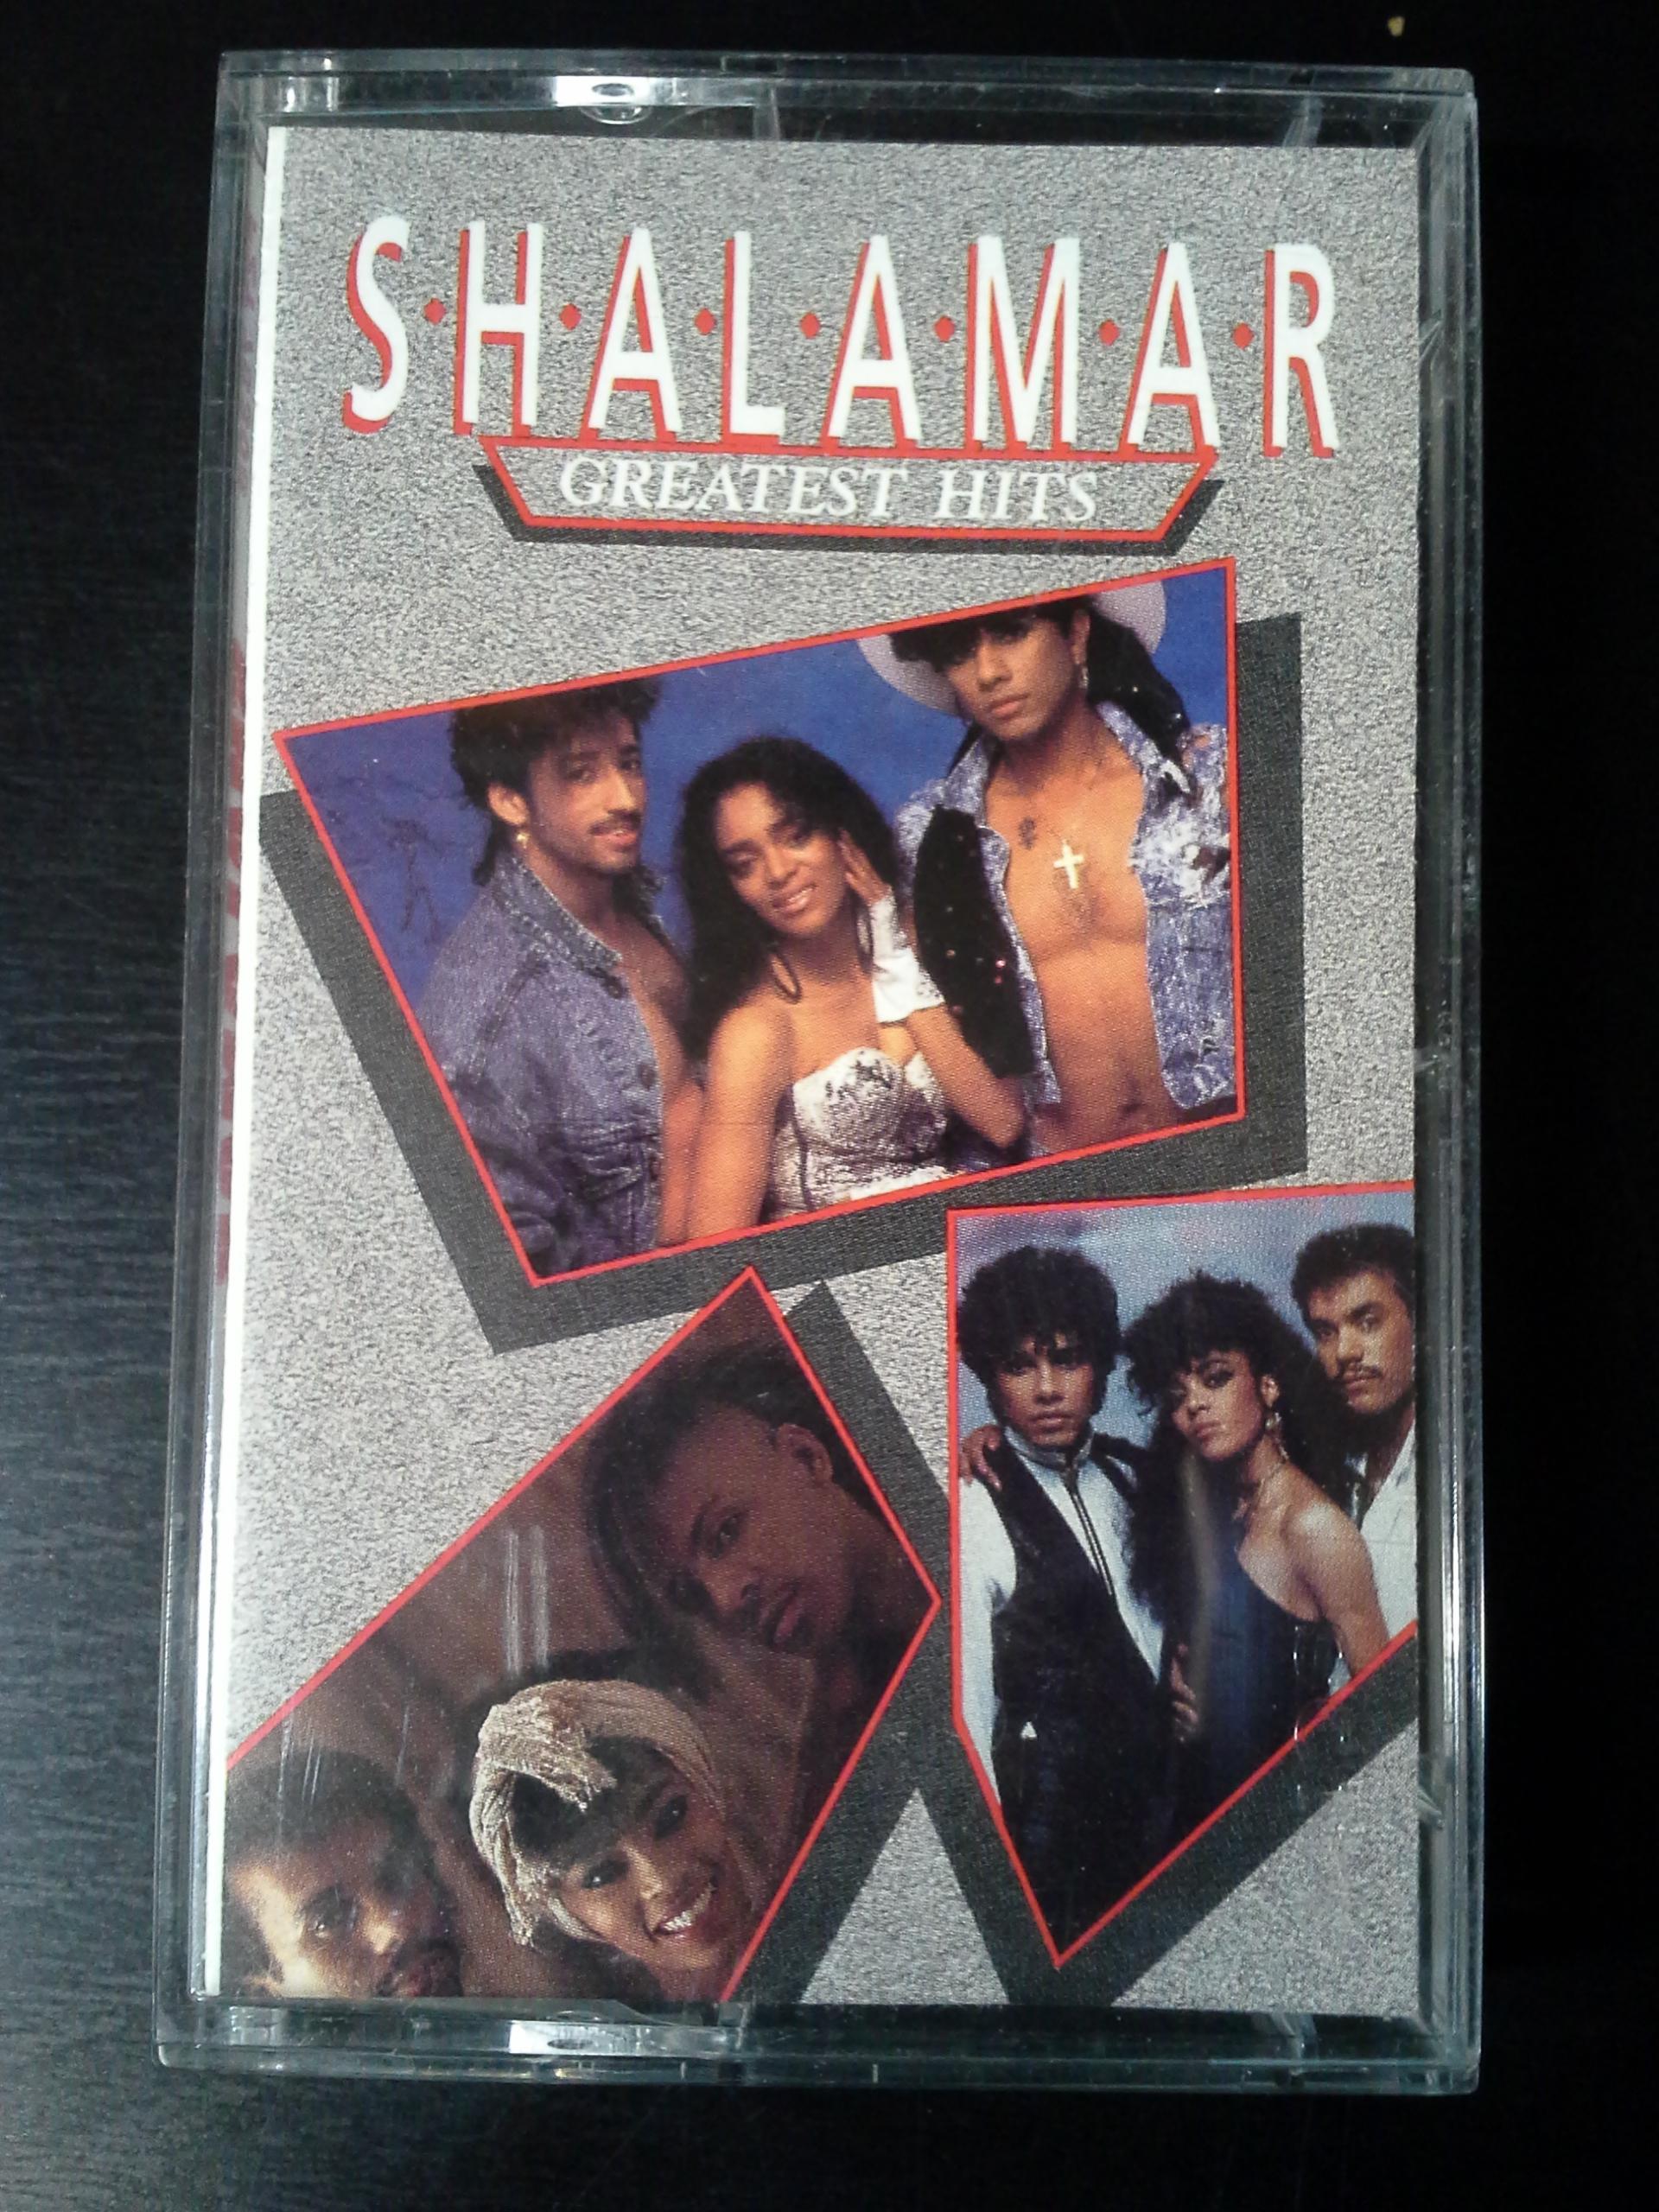 Used Cassette Shalamar Greatest Hits 1989 Epic Vinylbay777